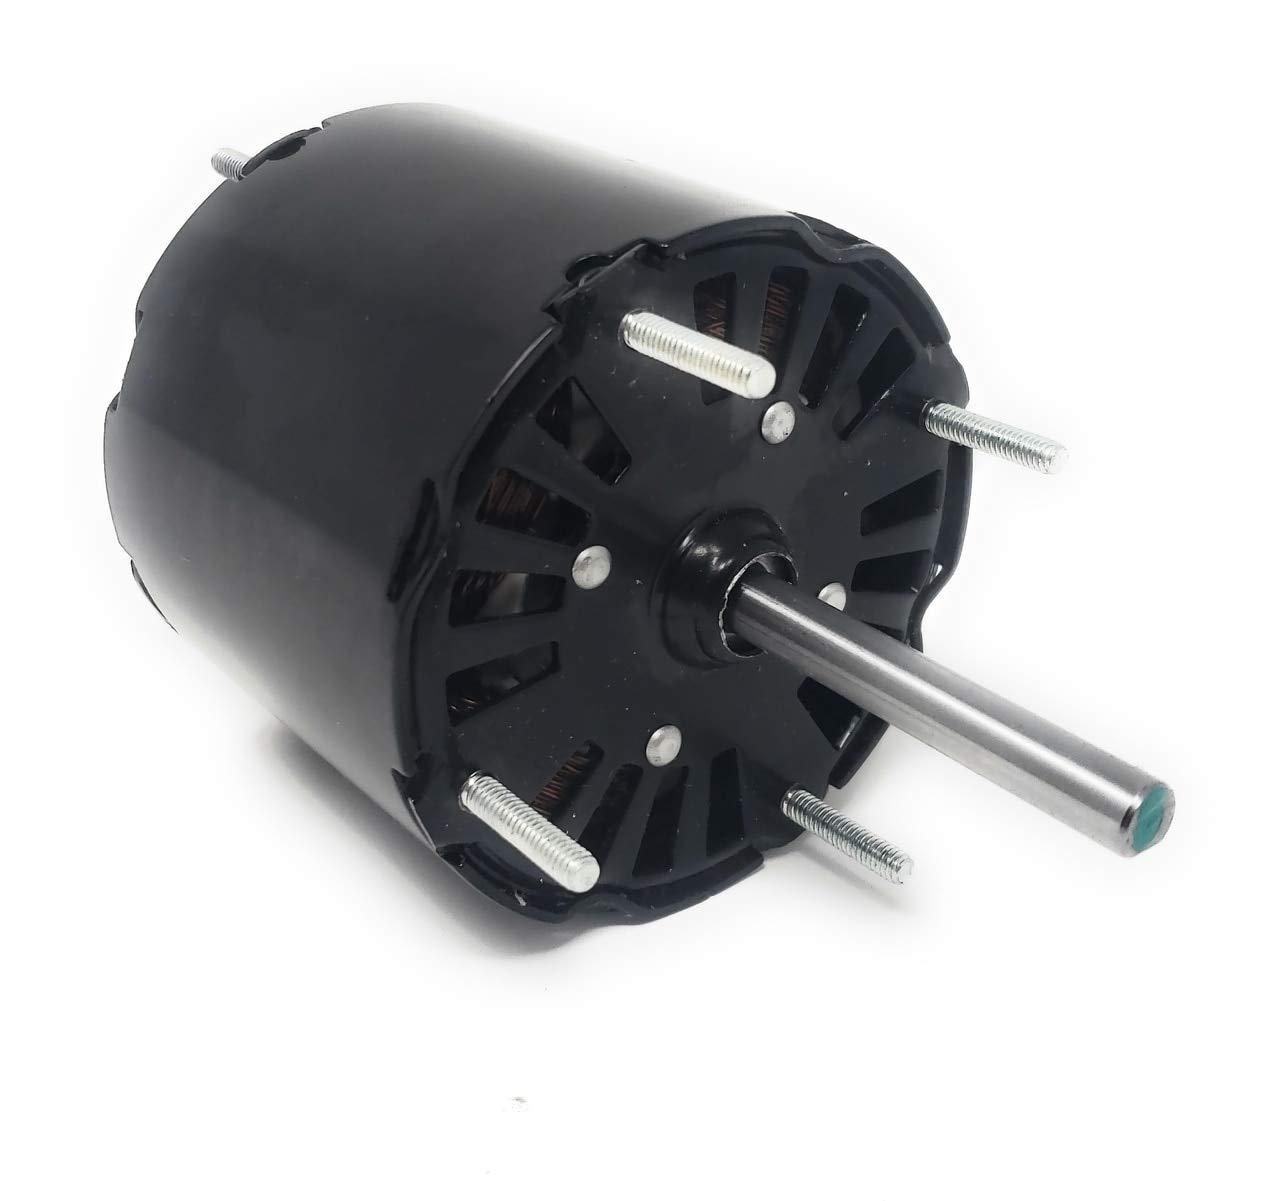 3.3-Inch General Purpose Motor | Replaces: Fasco D132 & Dayton 161M08